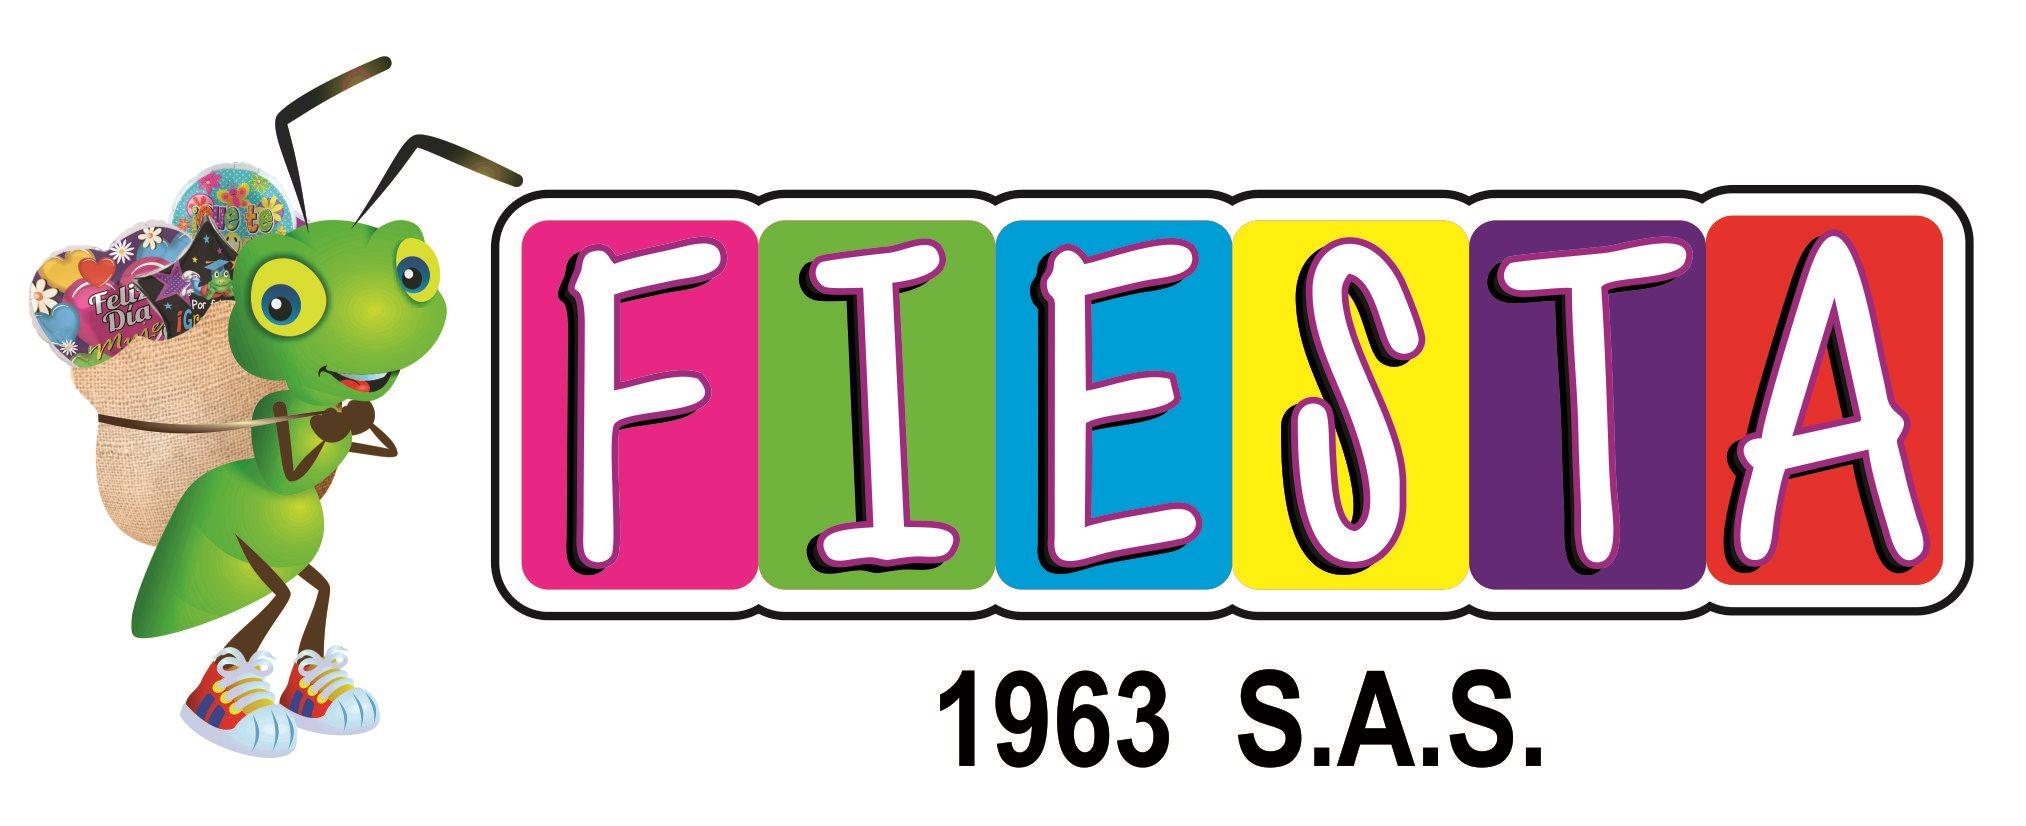 Fiesta 1963 S.A.S.